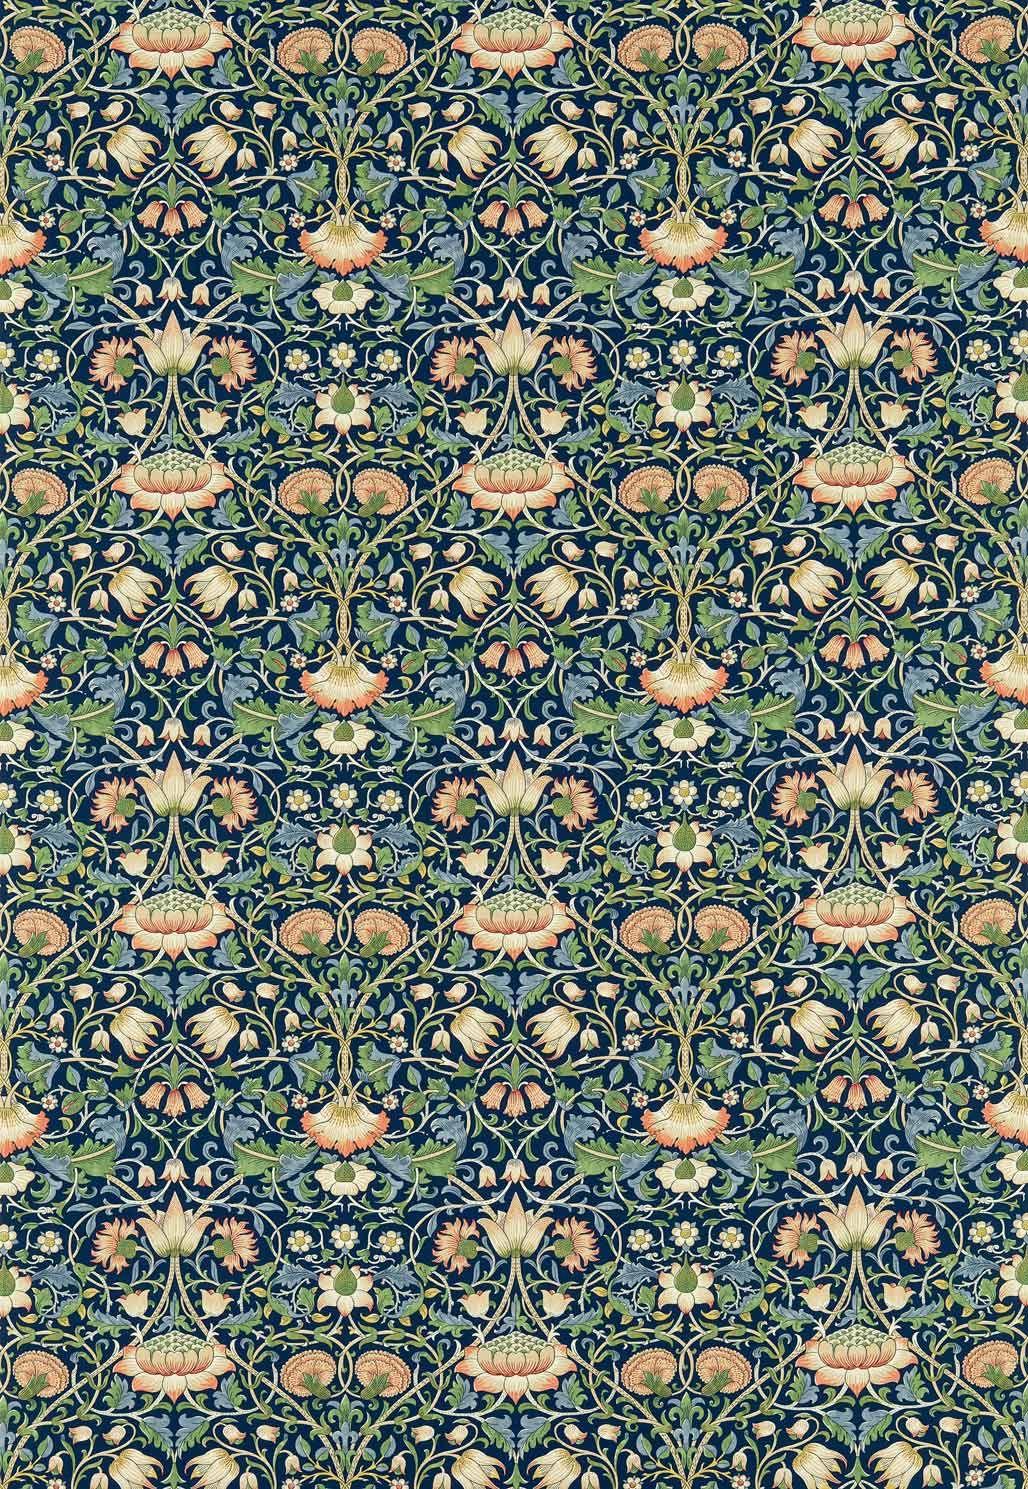 Tapete Englisch morris englische tapeten 14 jpg 1 028 1 489 pixel wallpaper